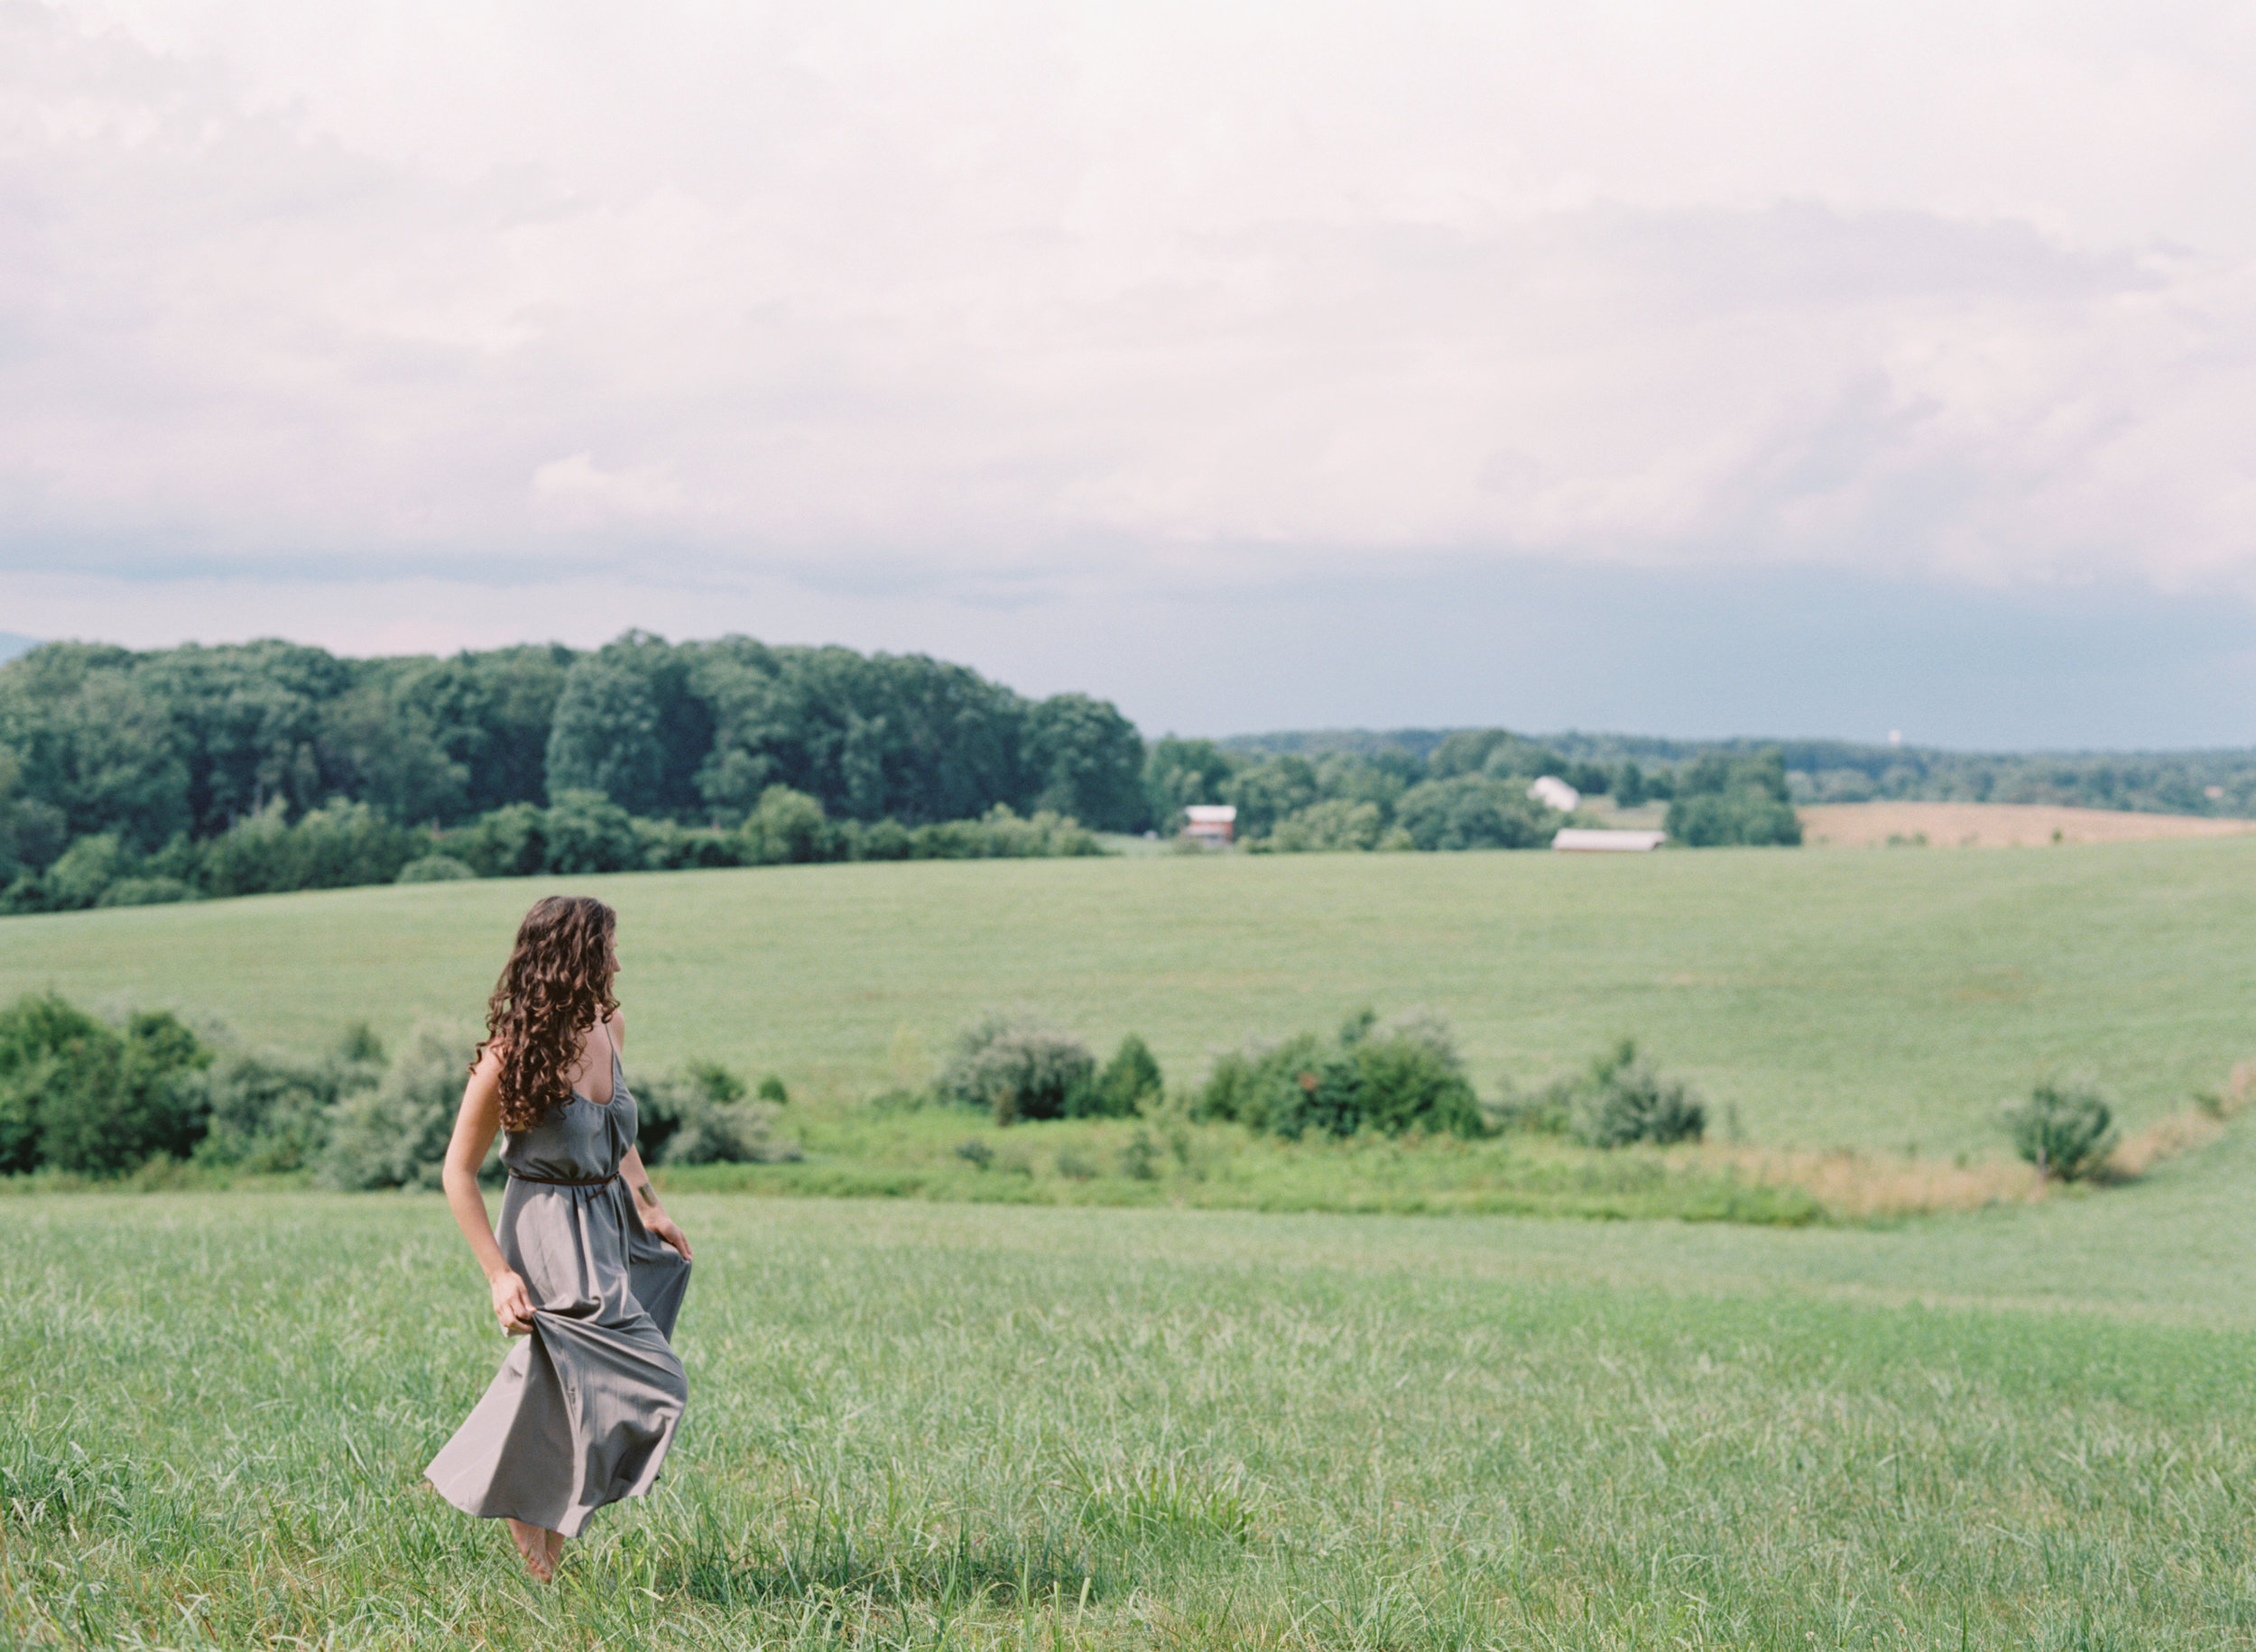 Photo | Elisa Bricker